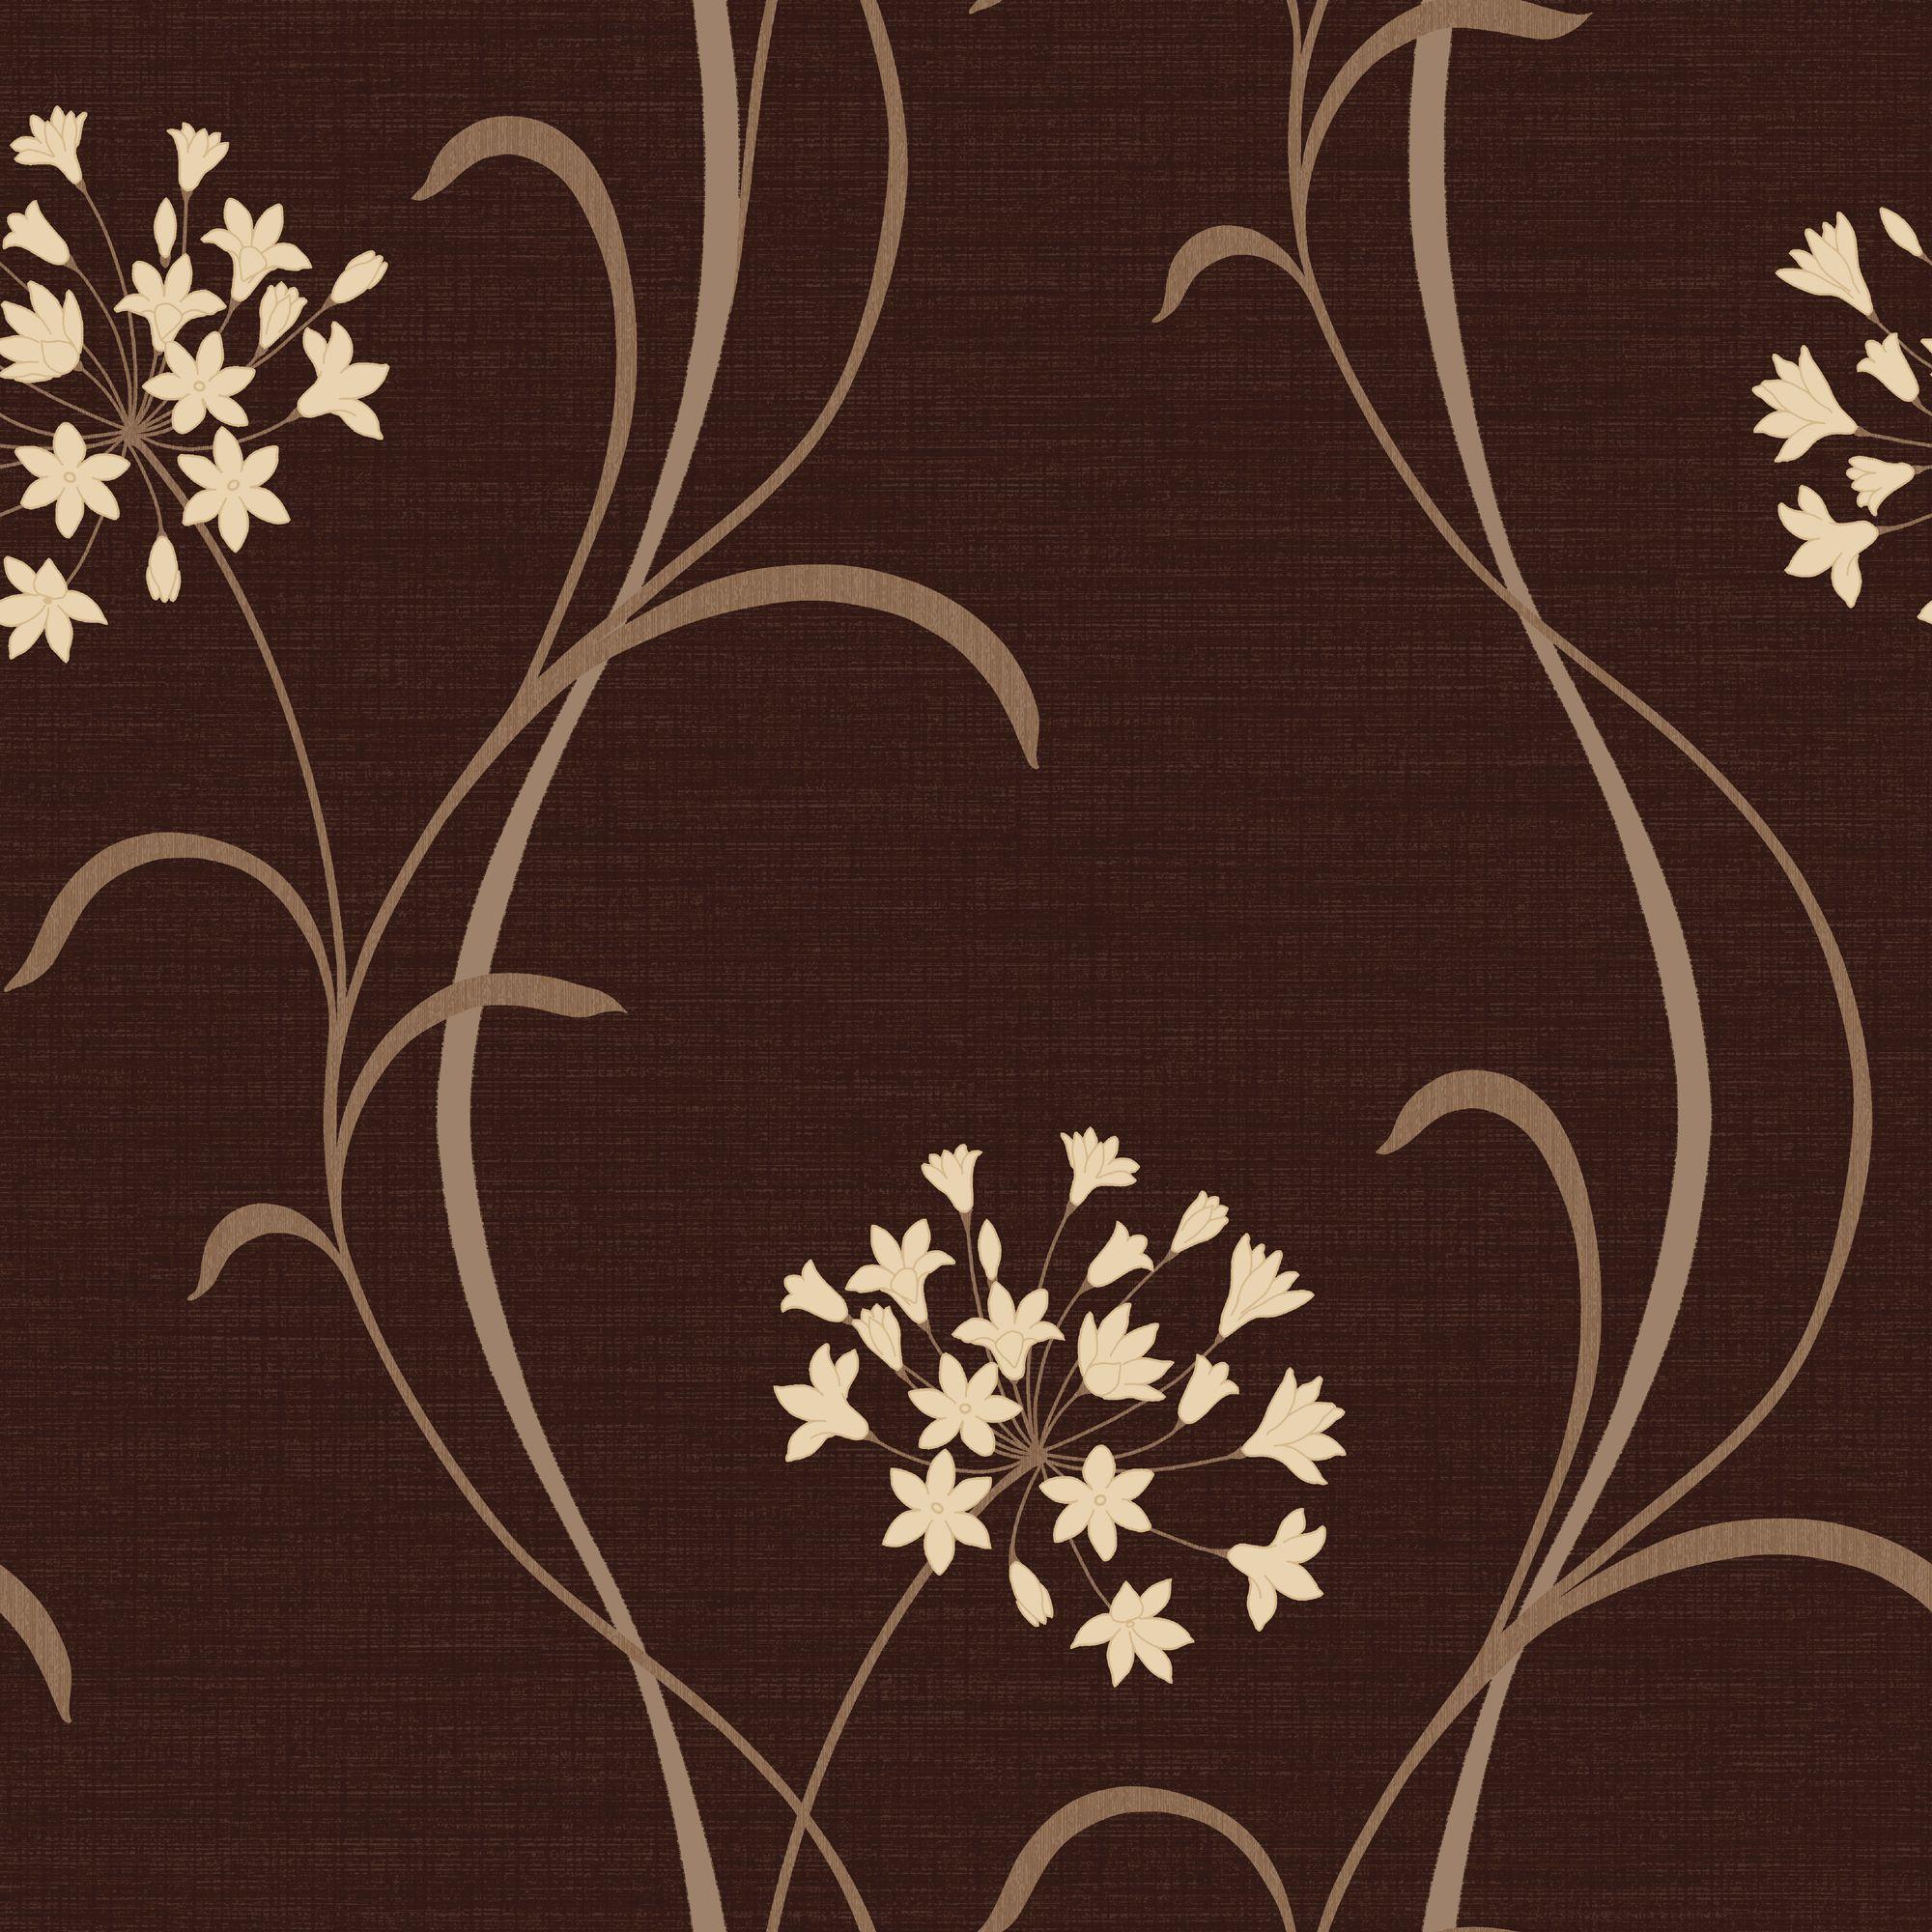 Home diy wallpaper illustration arthouse imagine fern plum motif vinyl - Arthouse Opera Mia Soft Sheen Highlights Dark Chocolate Wallpaper Departments Diy At B Q